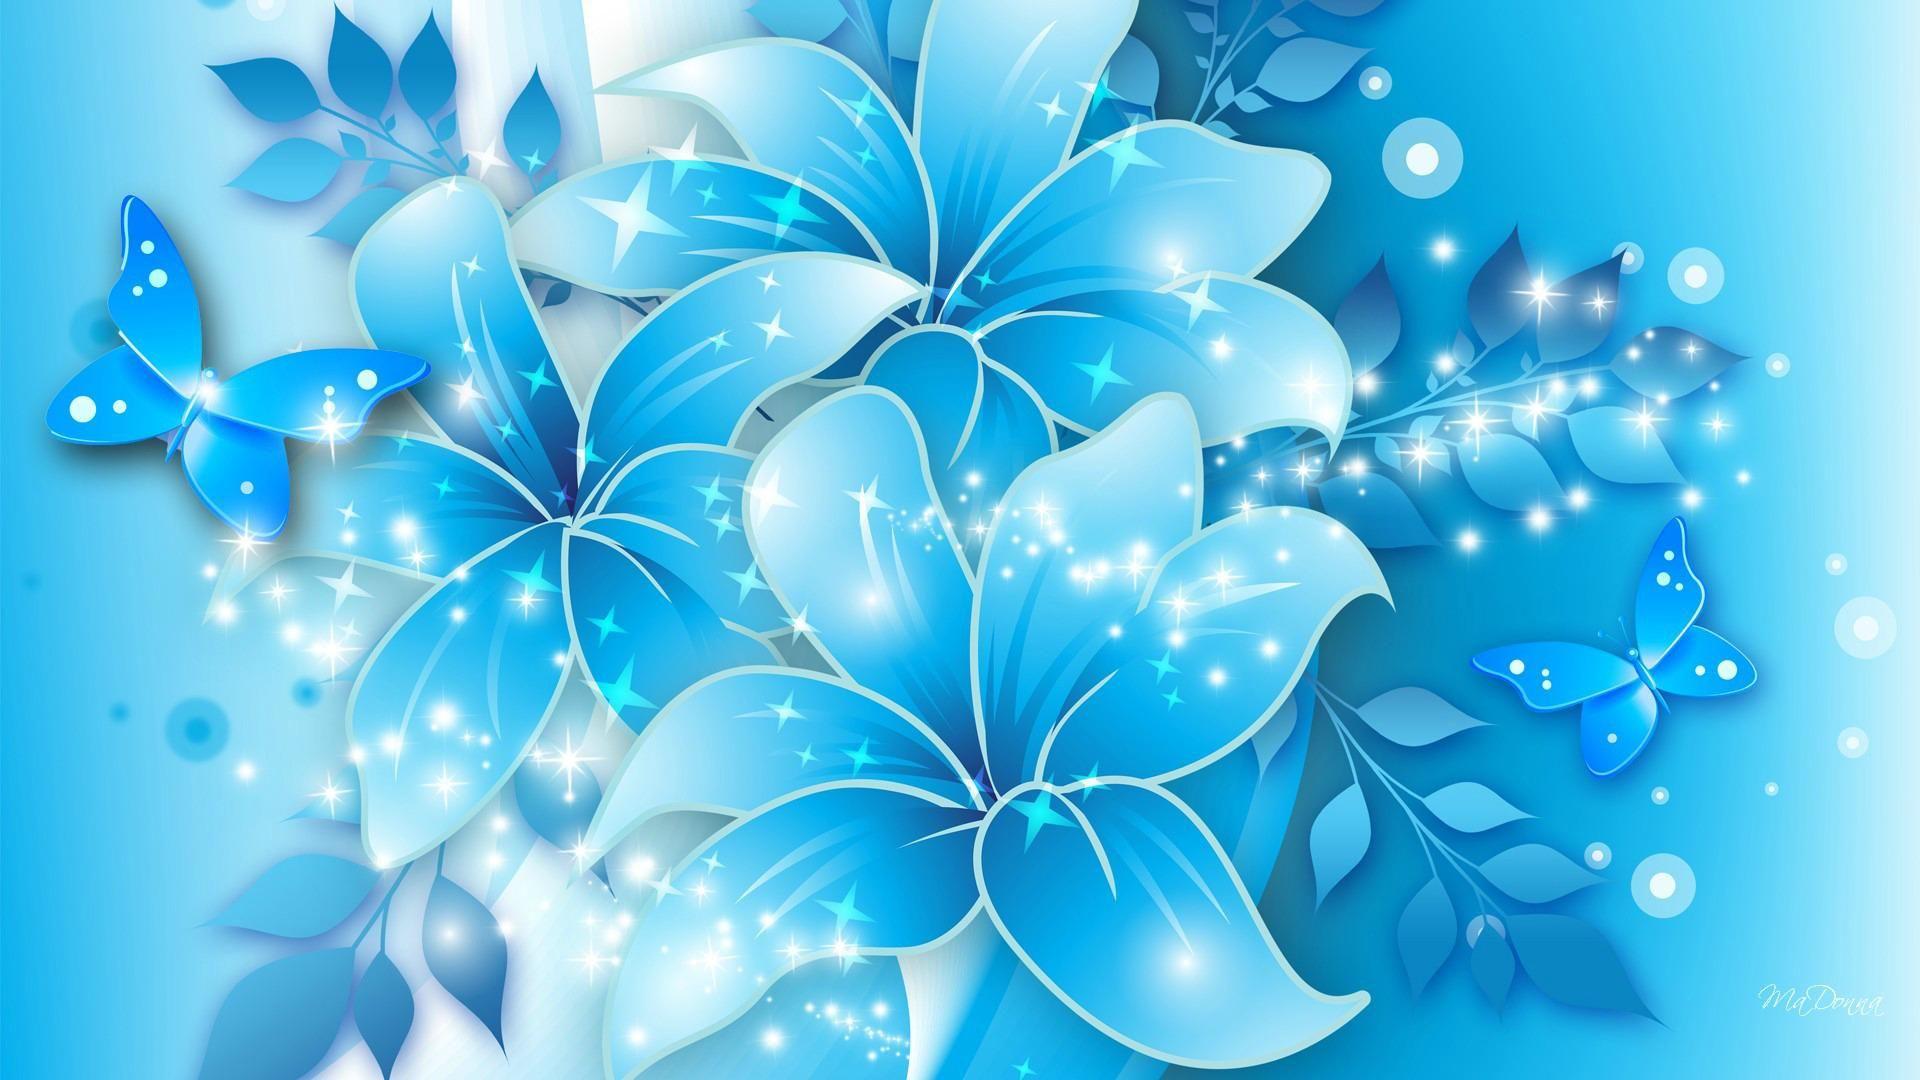 Blue Jays Desktop Wallpaper Best Wallpaper Hd Blue Flower Wallpaper Blue Flowers Background Blue Background Wallpapers